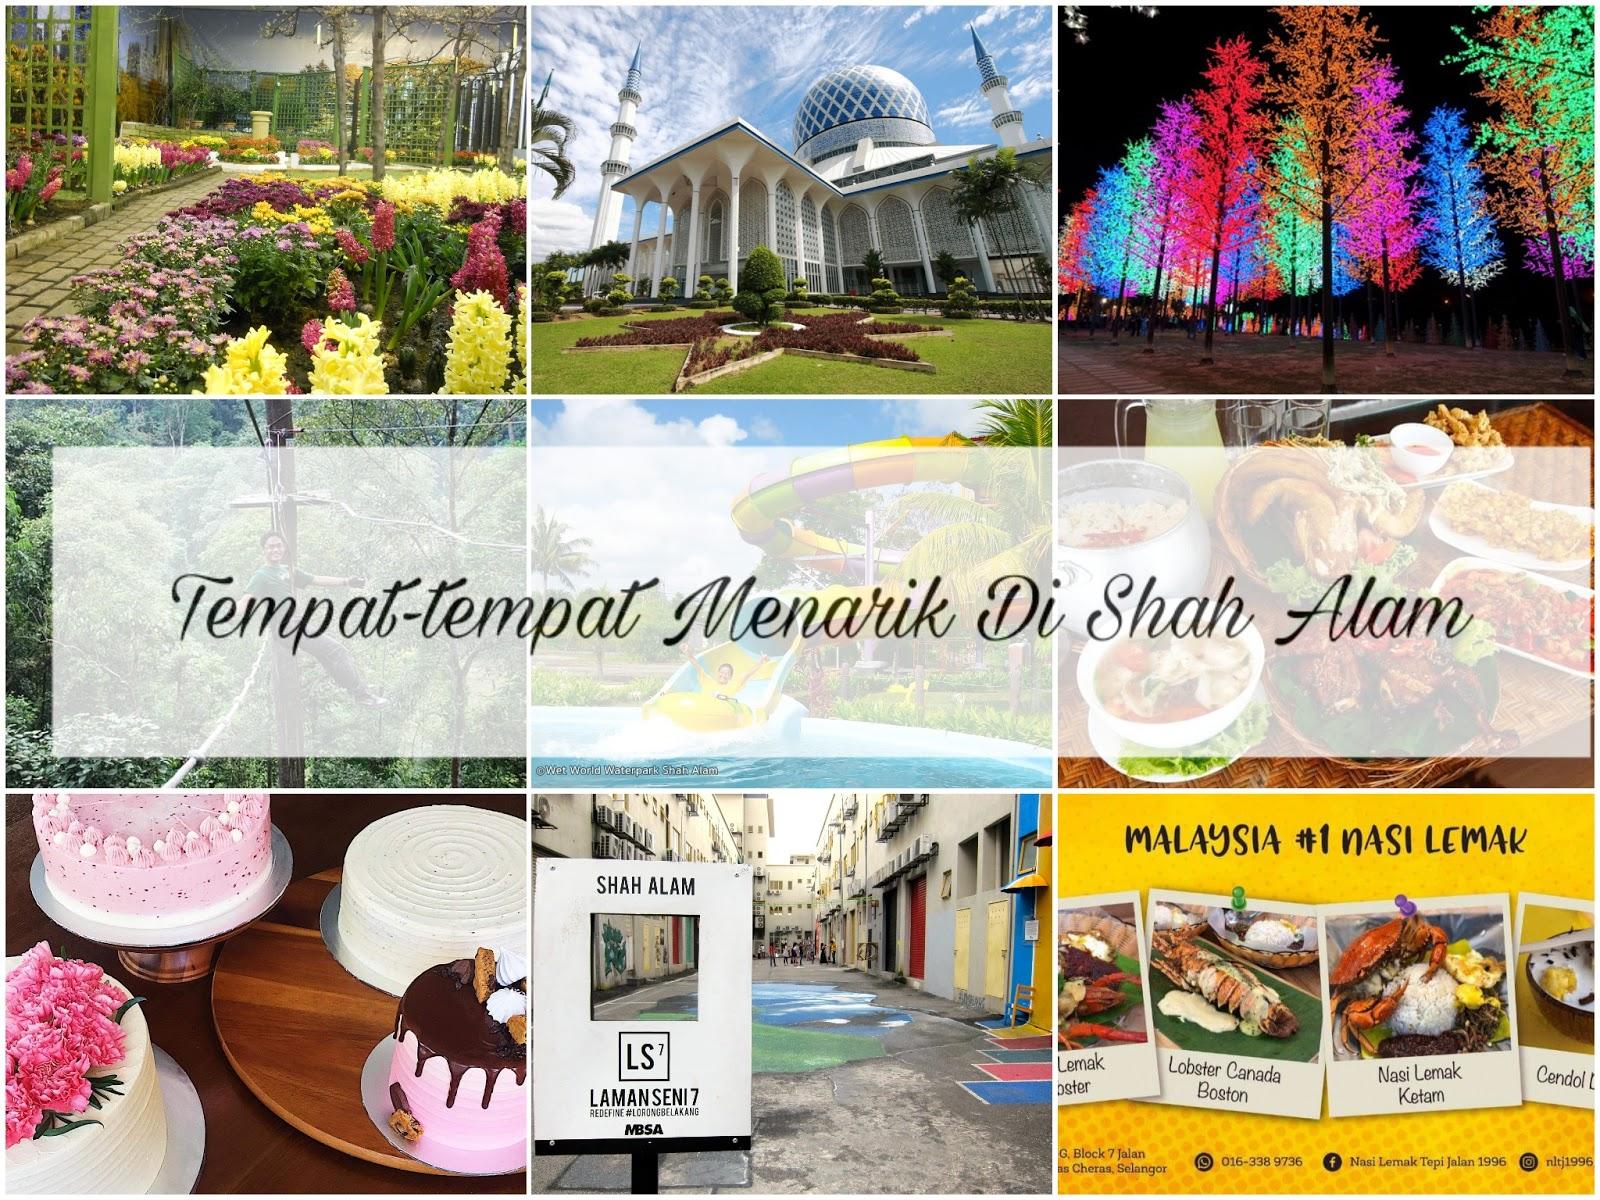 Tempat-tempat Menarik Di Shah Alam Yang Wajib Di Kunjungi